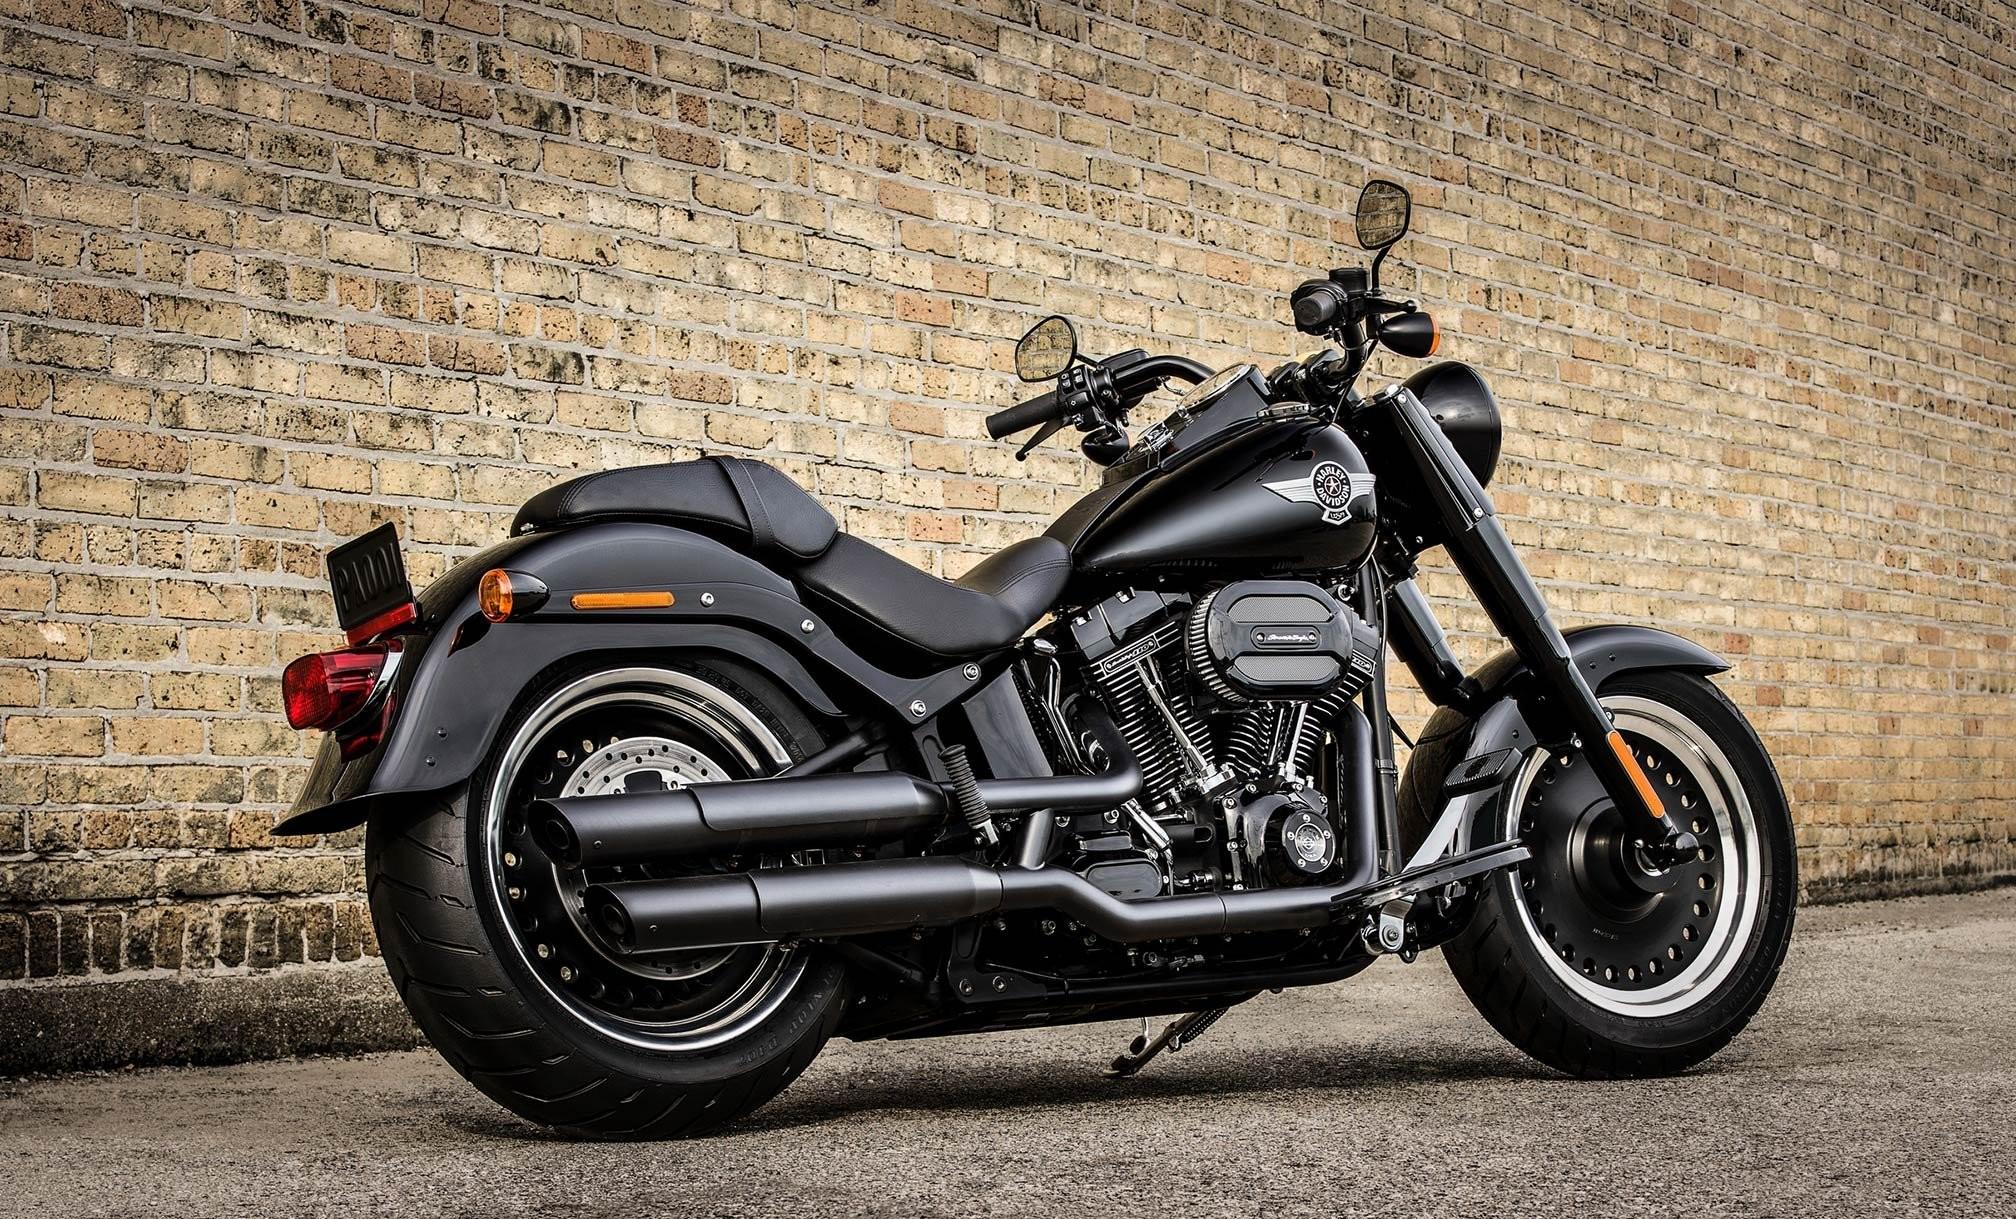 Harley Davidson Bikes Wallpapers Wallpapertag